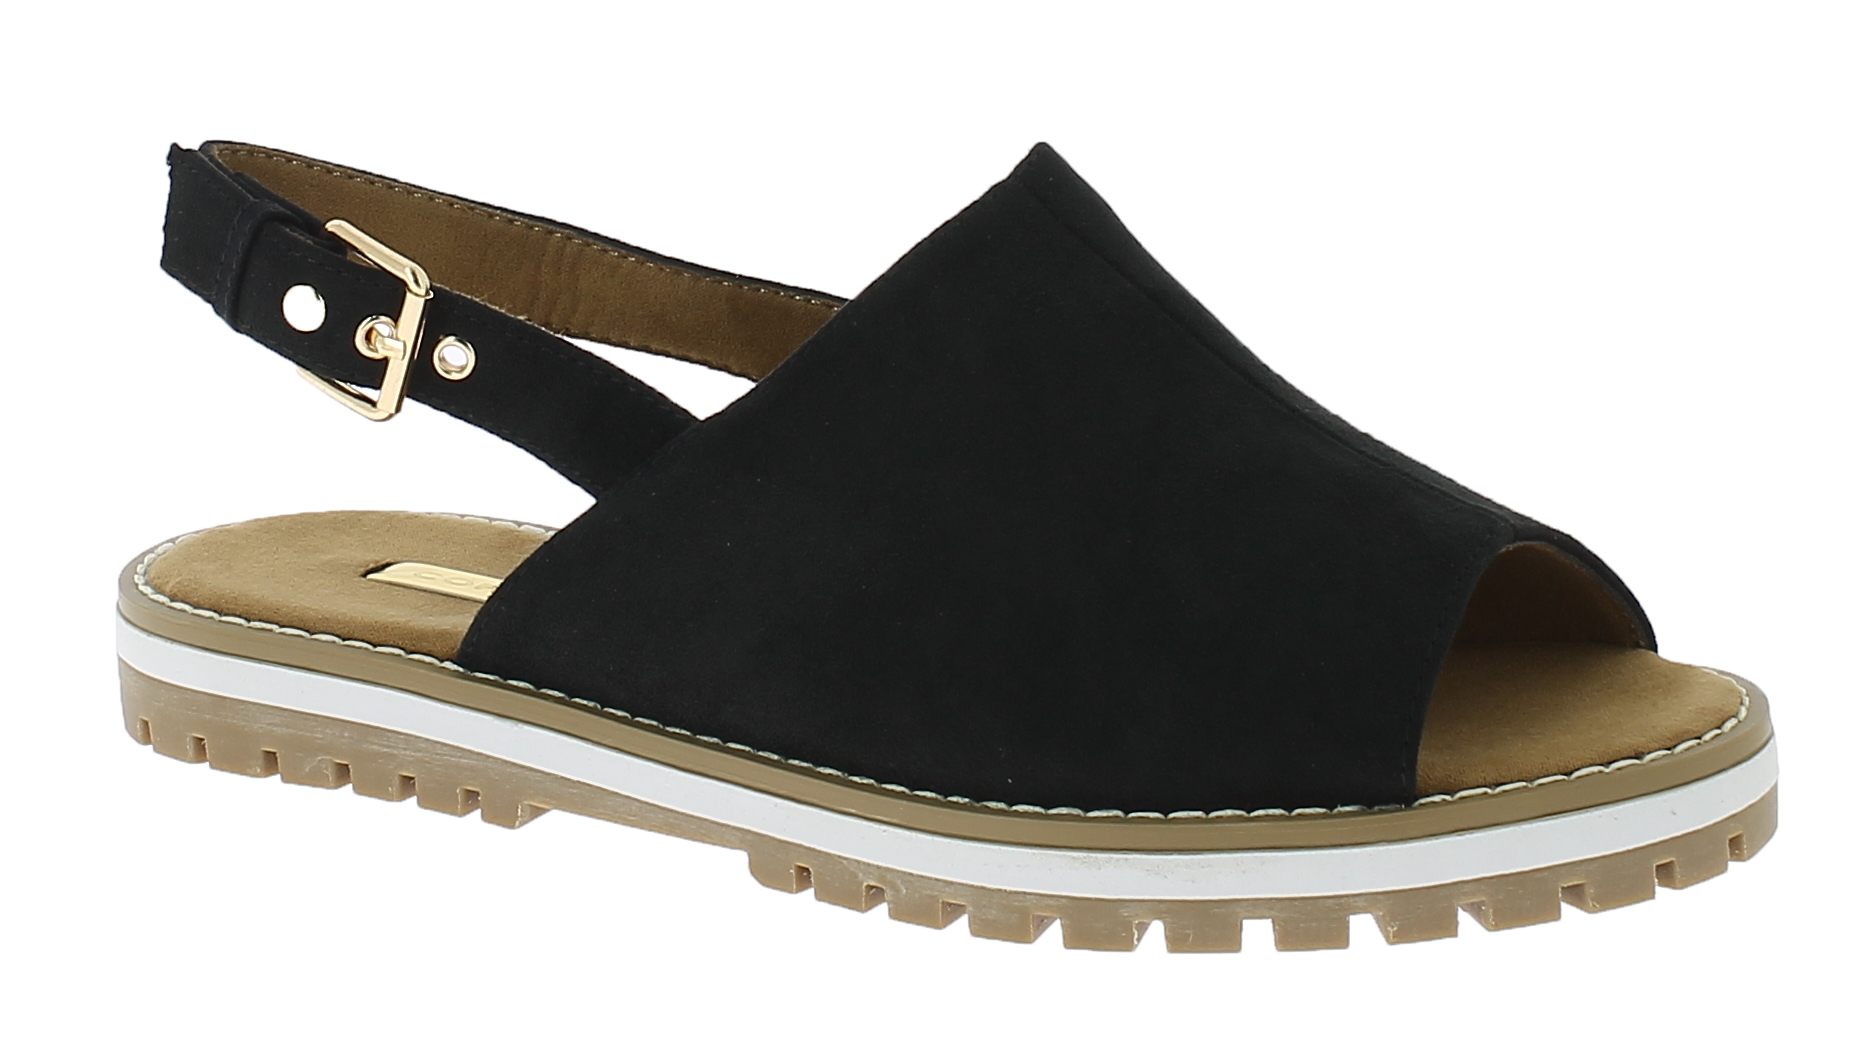 CORINA Γυναικείο Πέδιλο C7342 Μαύρο - IqShoes - C7342 BLACK-black-37/1/15/27 παπούτσια  πέδιλα